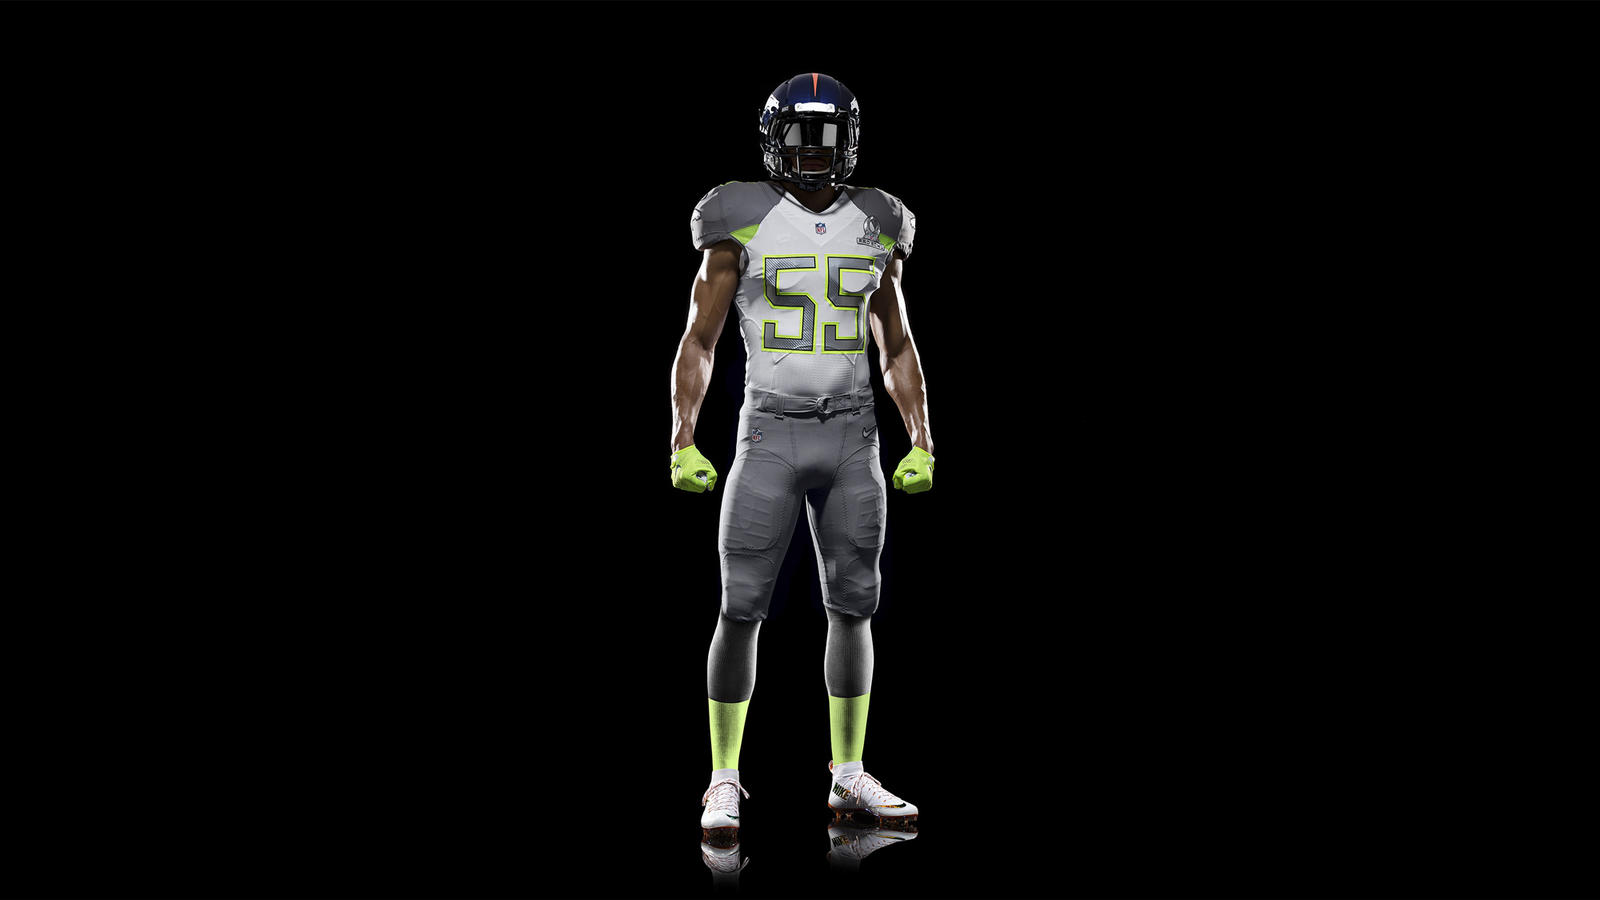 Pro_Bowl_2015_uniforms_team_Carter_1